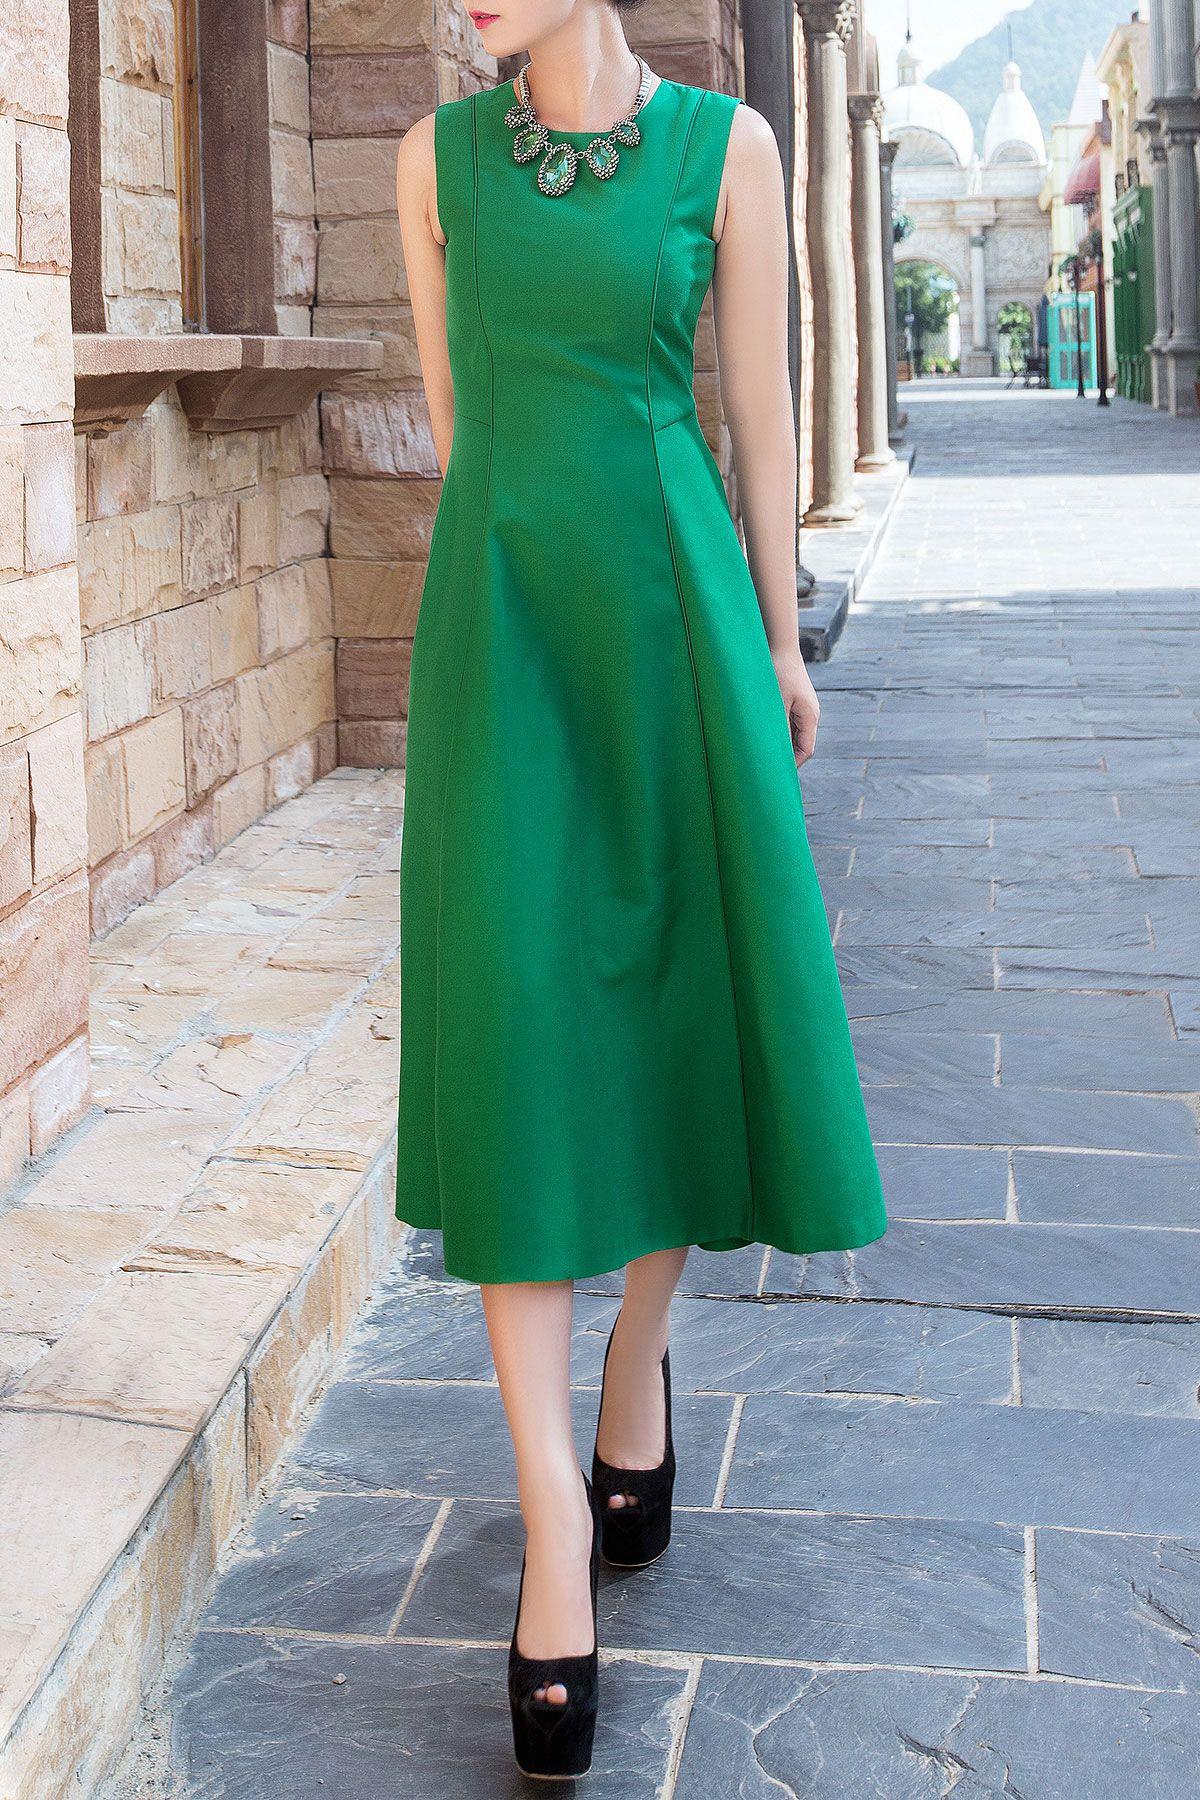 Zip Up Pure Color Tank Dress